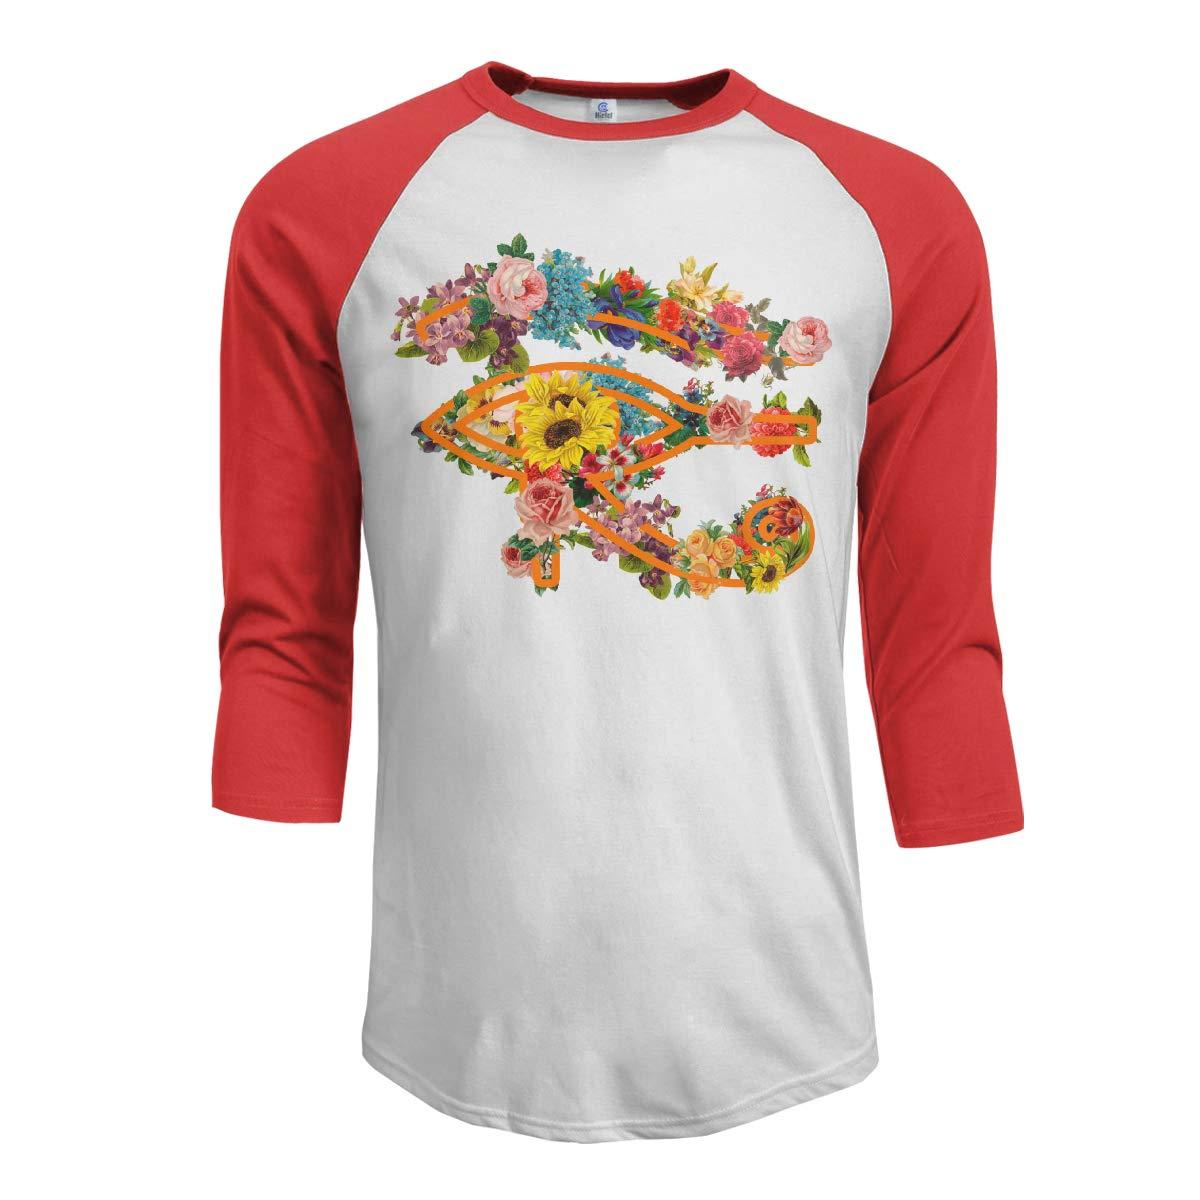 3//4 Long Sleeves Boys Jersey Tee Shirt Black MiiyarHome Mens Raglan Sleeves Baseball T-Shirts Home Pyramid